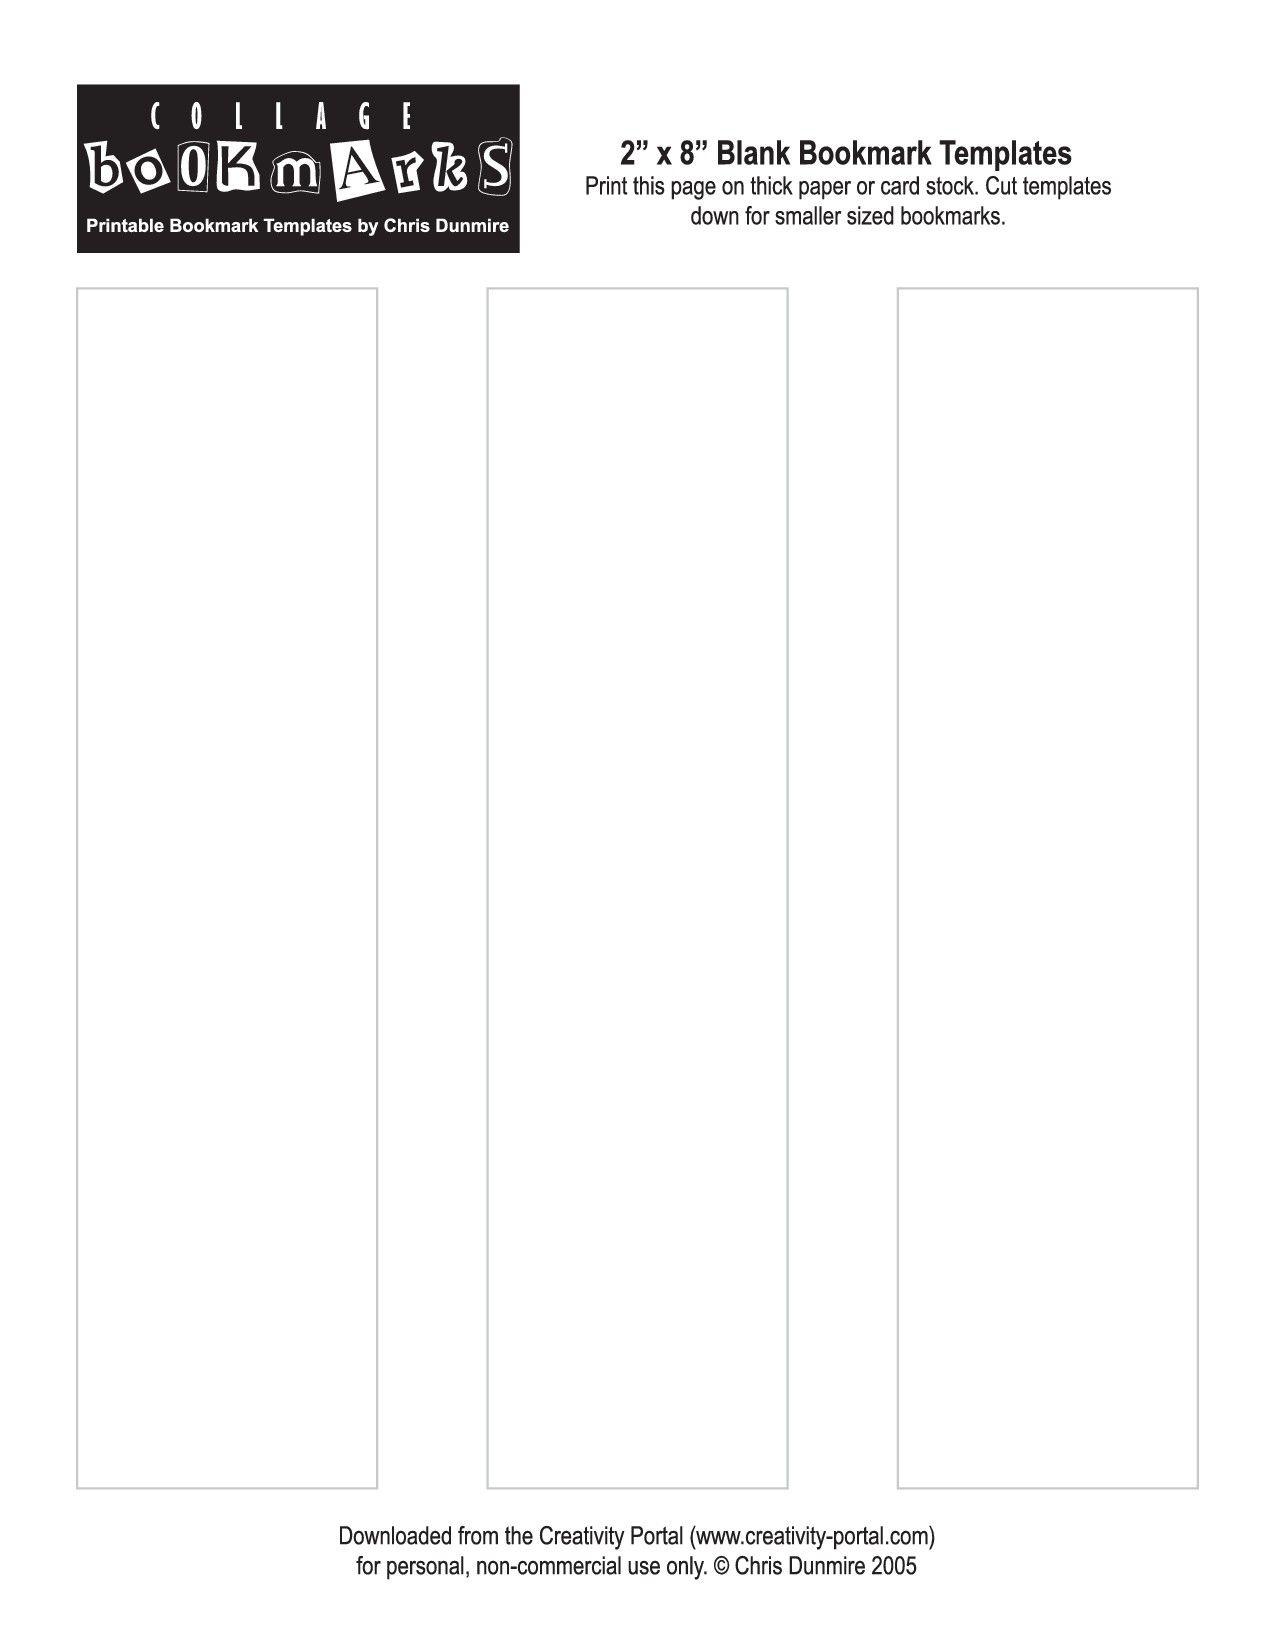 Blank Bookmark Template Printable   Printables!@!@!@   Bookmark - Free Printable Blank Bookmarks